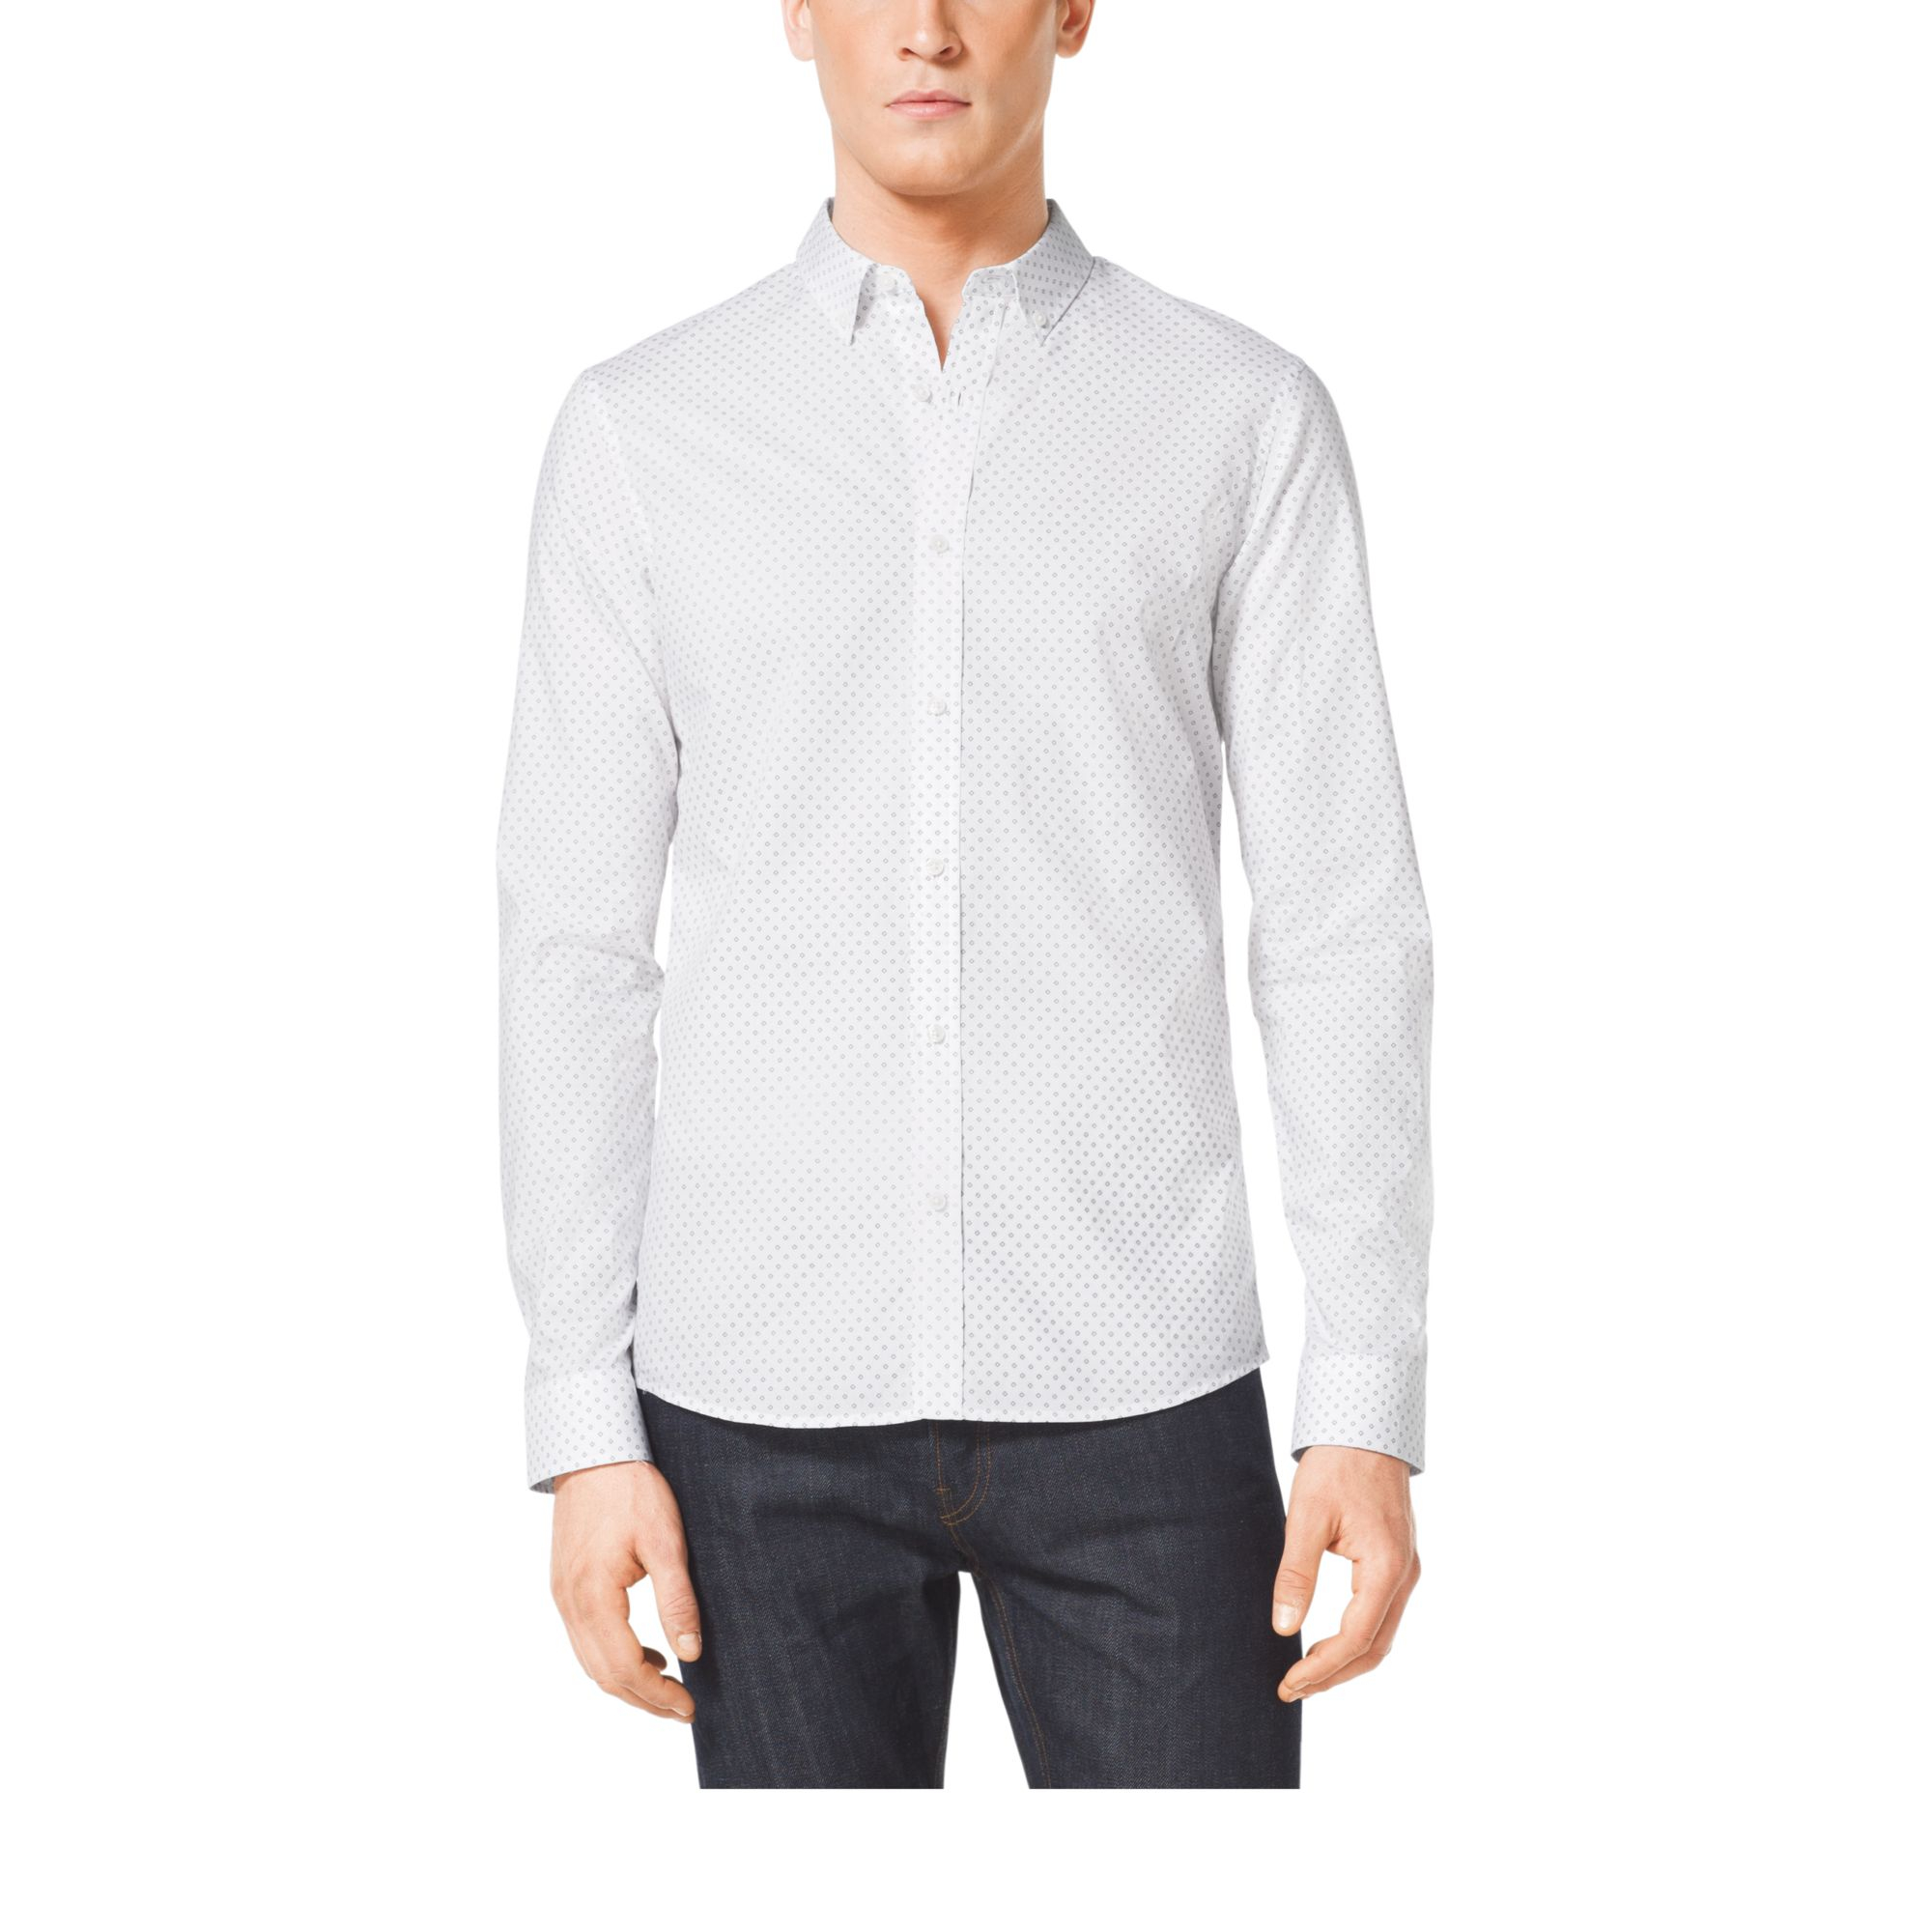 Lyst michael kors slim fit cotton shirt in white for men for Slim fit cotton shirts